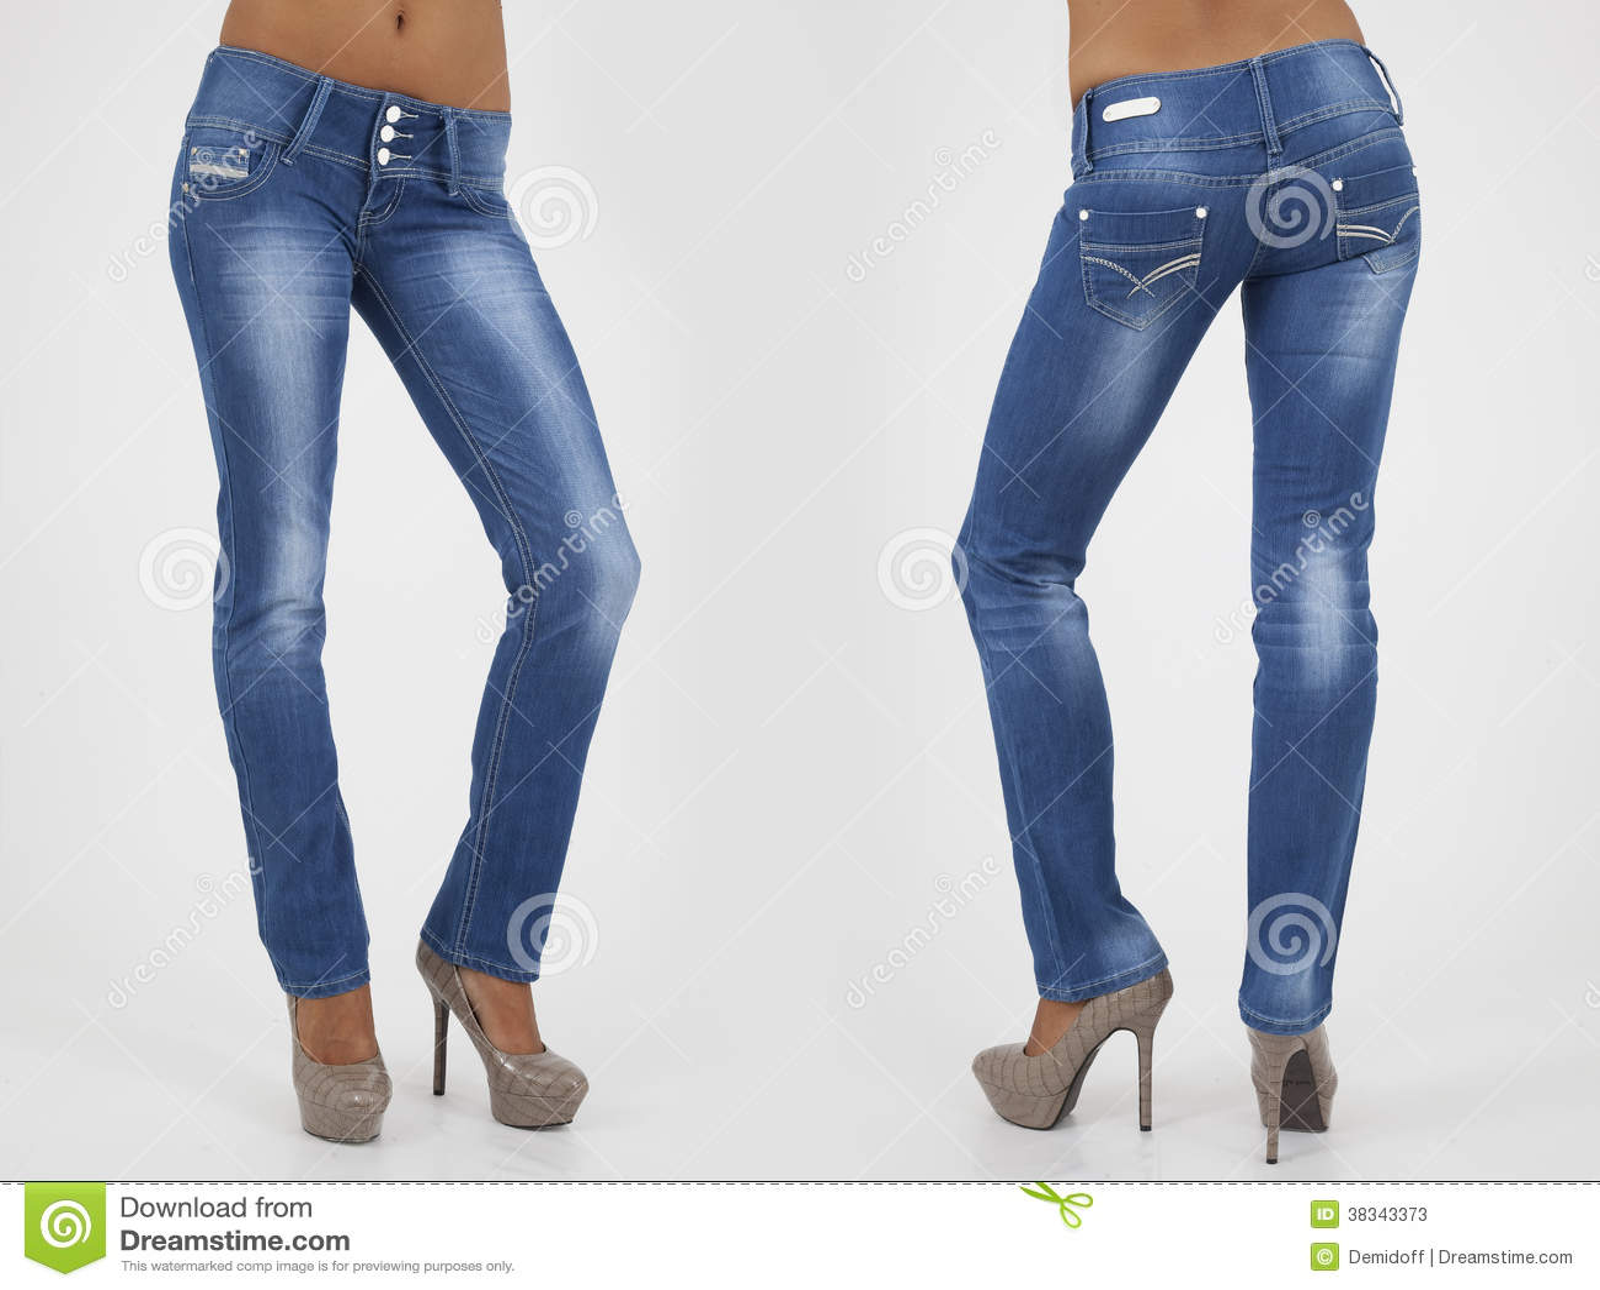 ed8b27f8f7 Donne Graziose In Jeans Stretti Immagine Stock - Immagine di ...